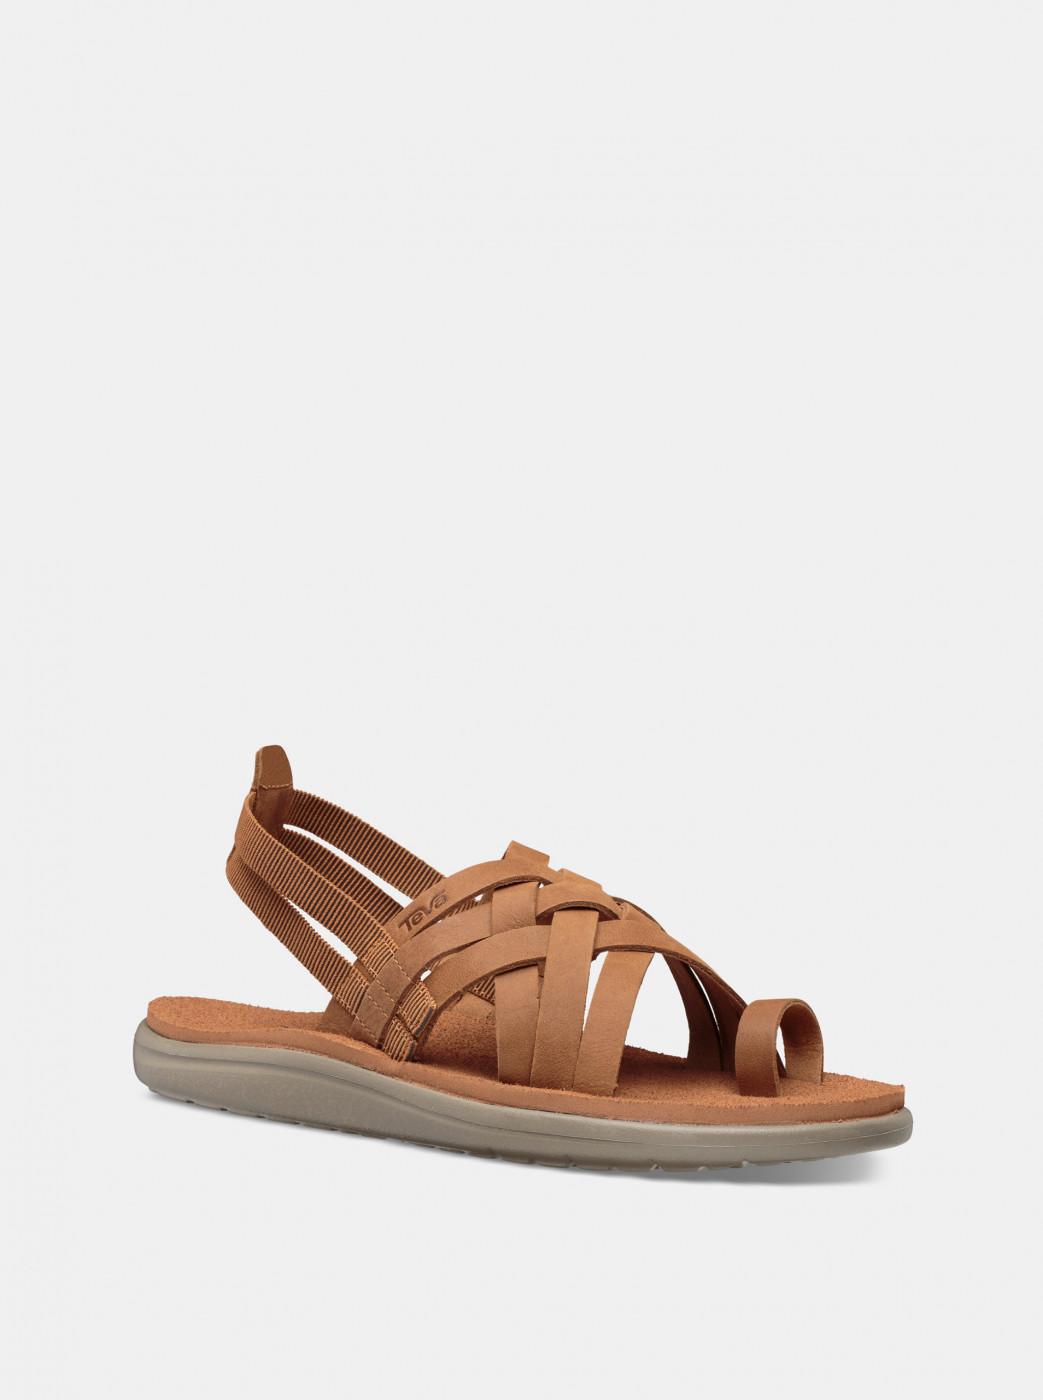 Teva Voya Strappy Brown Women's Sandals